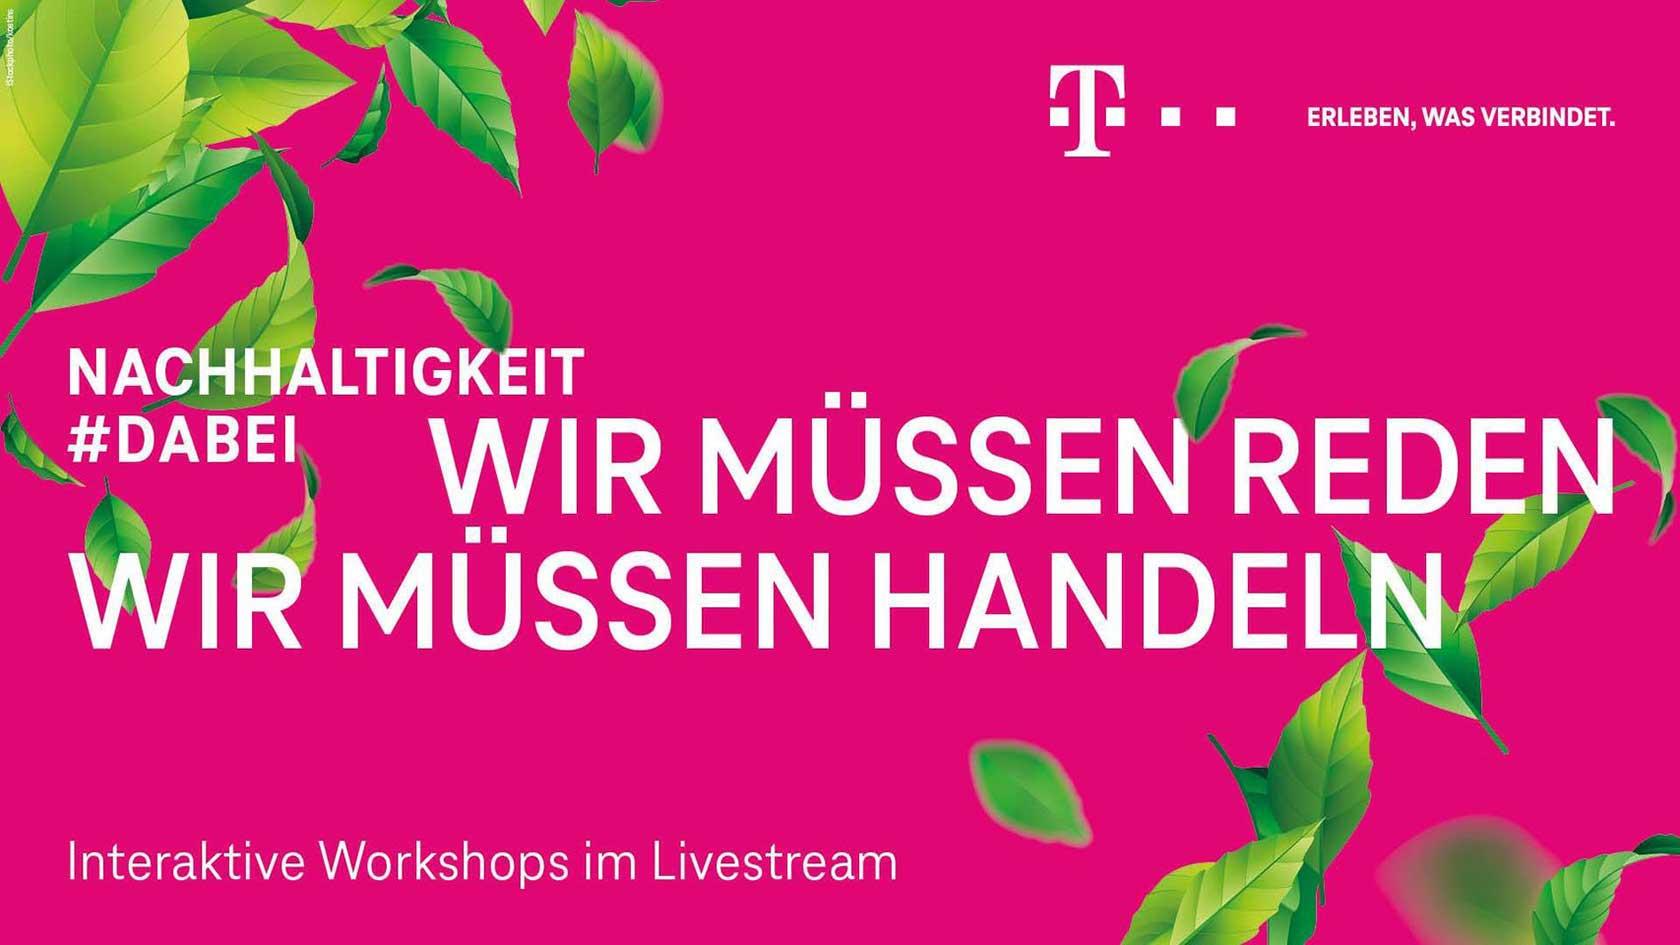 Header Picture for Nachhaltigkeit #dabei for Telekom - A PIRATEx online Event production